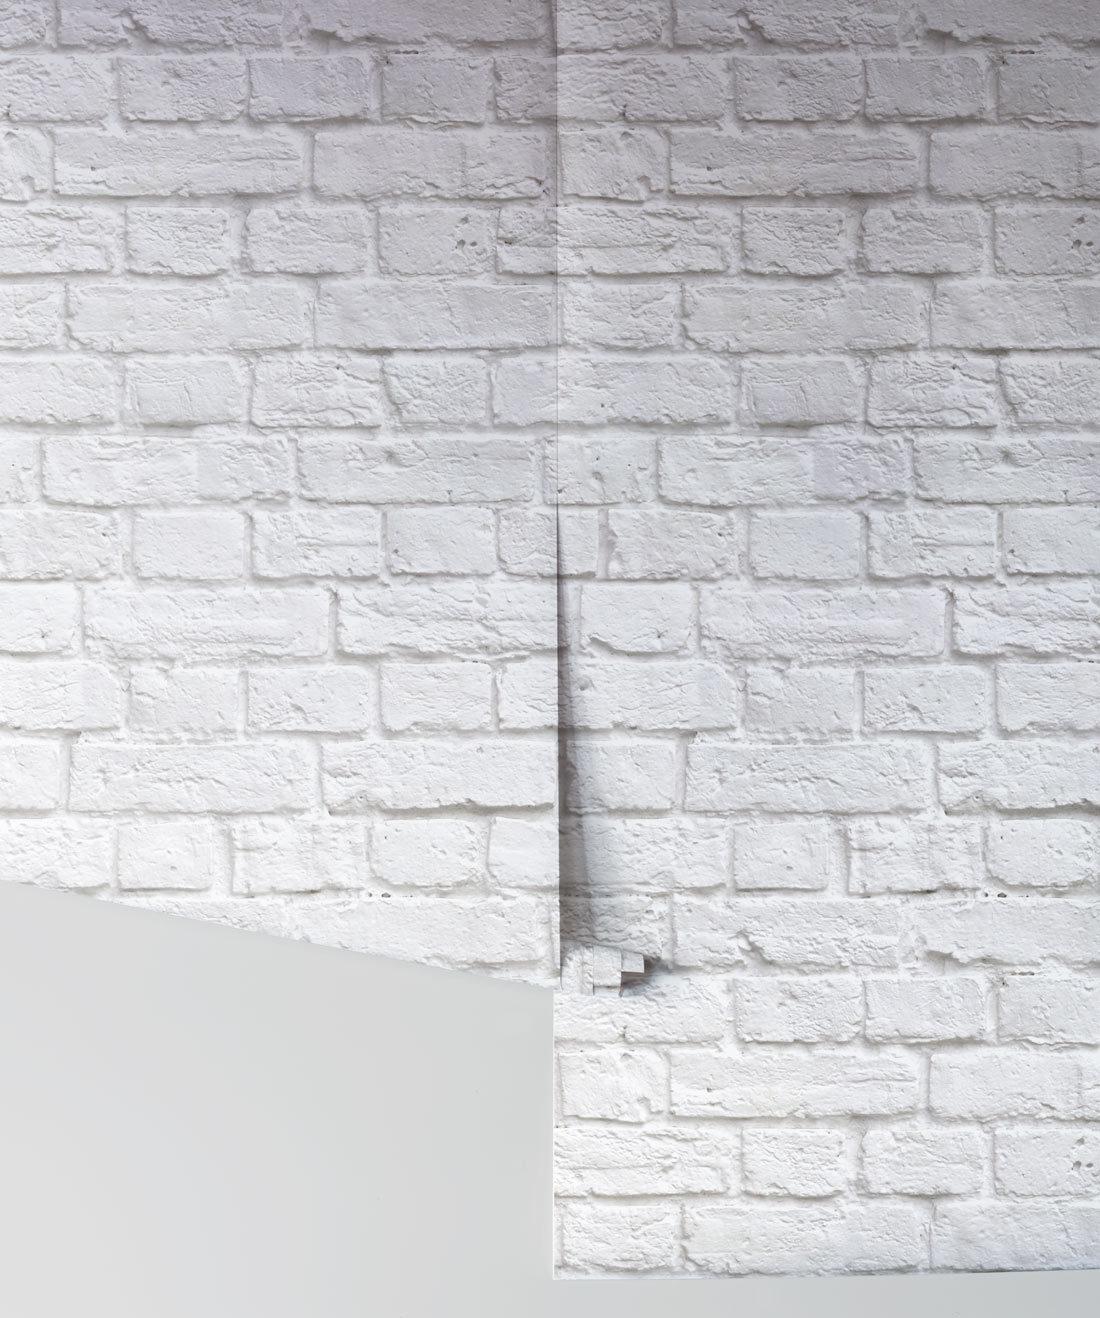 Soft White Bricks Wallpaper Realistic Accurate Bricks Milton King Aus